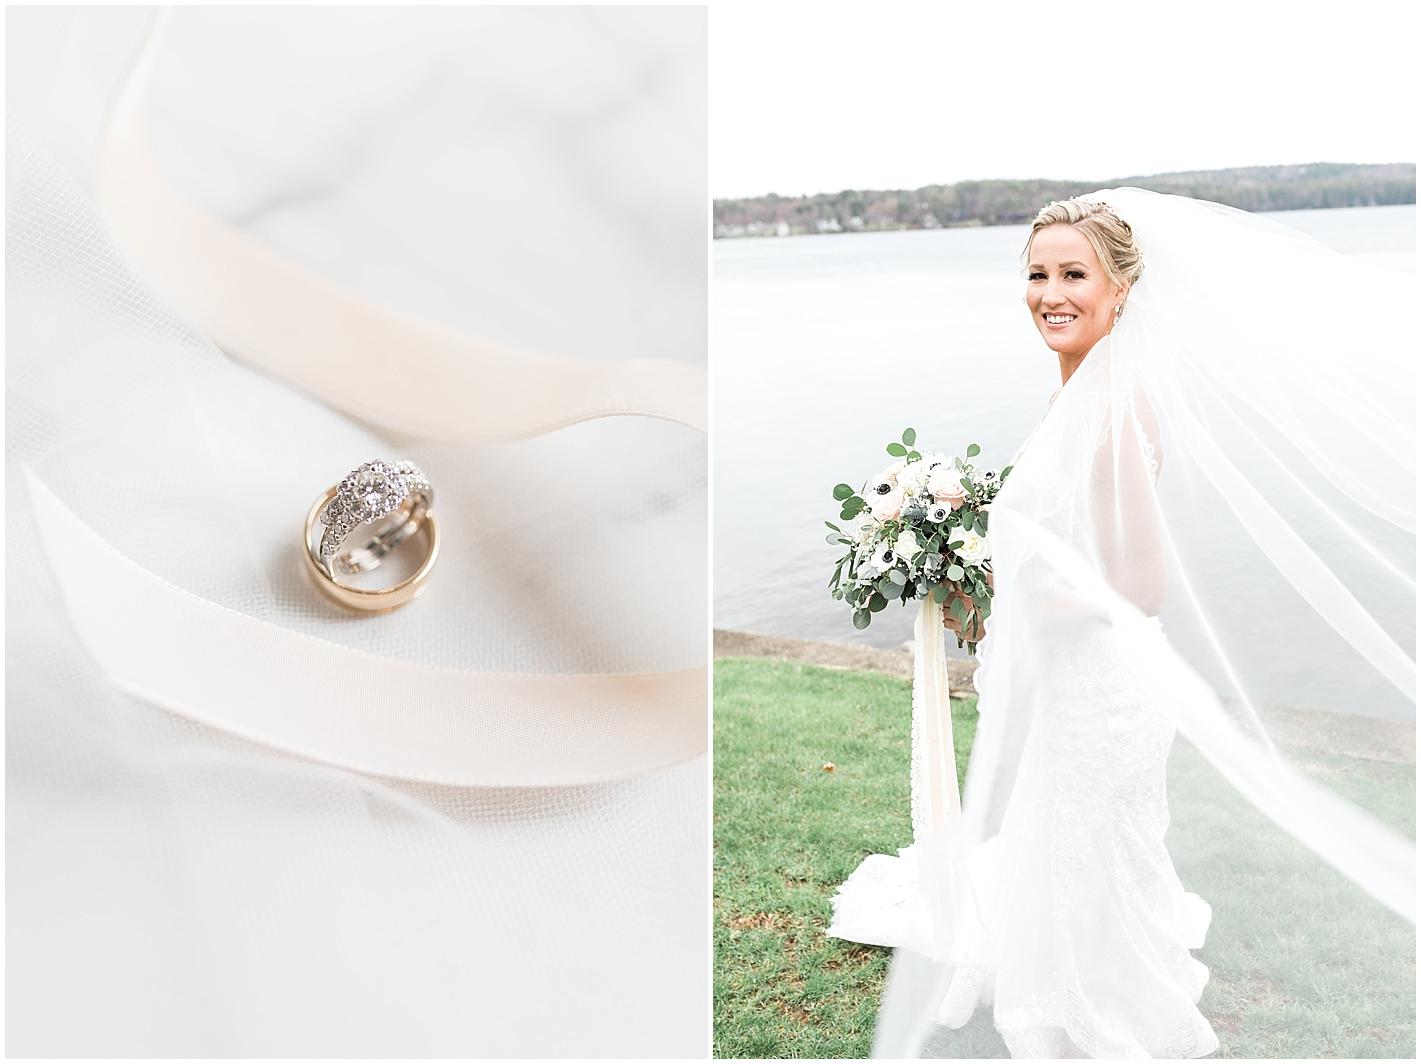 Long Veil Bridal Portraits by Alyssa Parker Photography